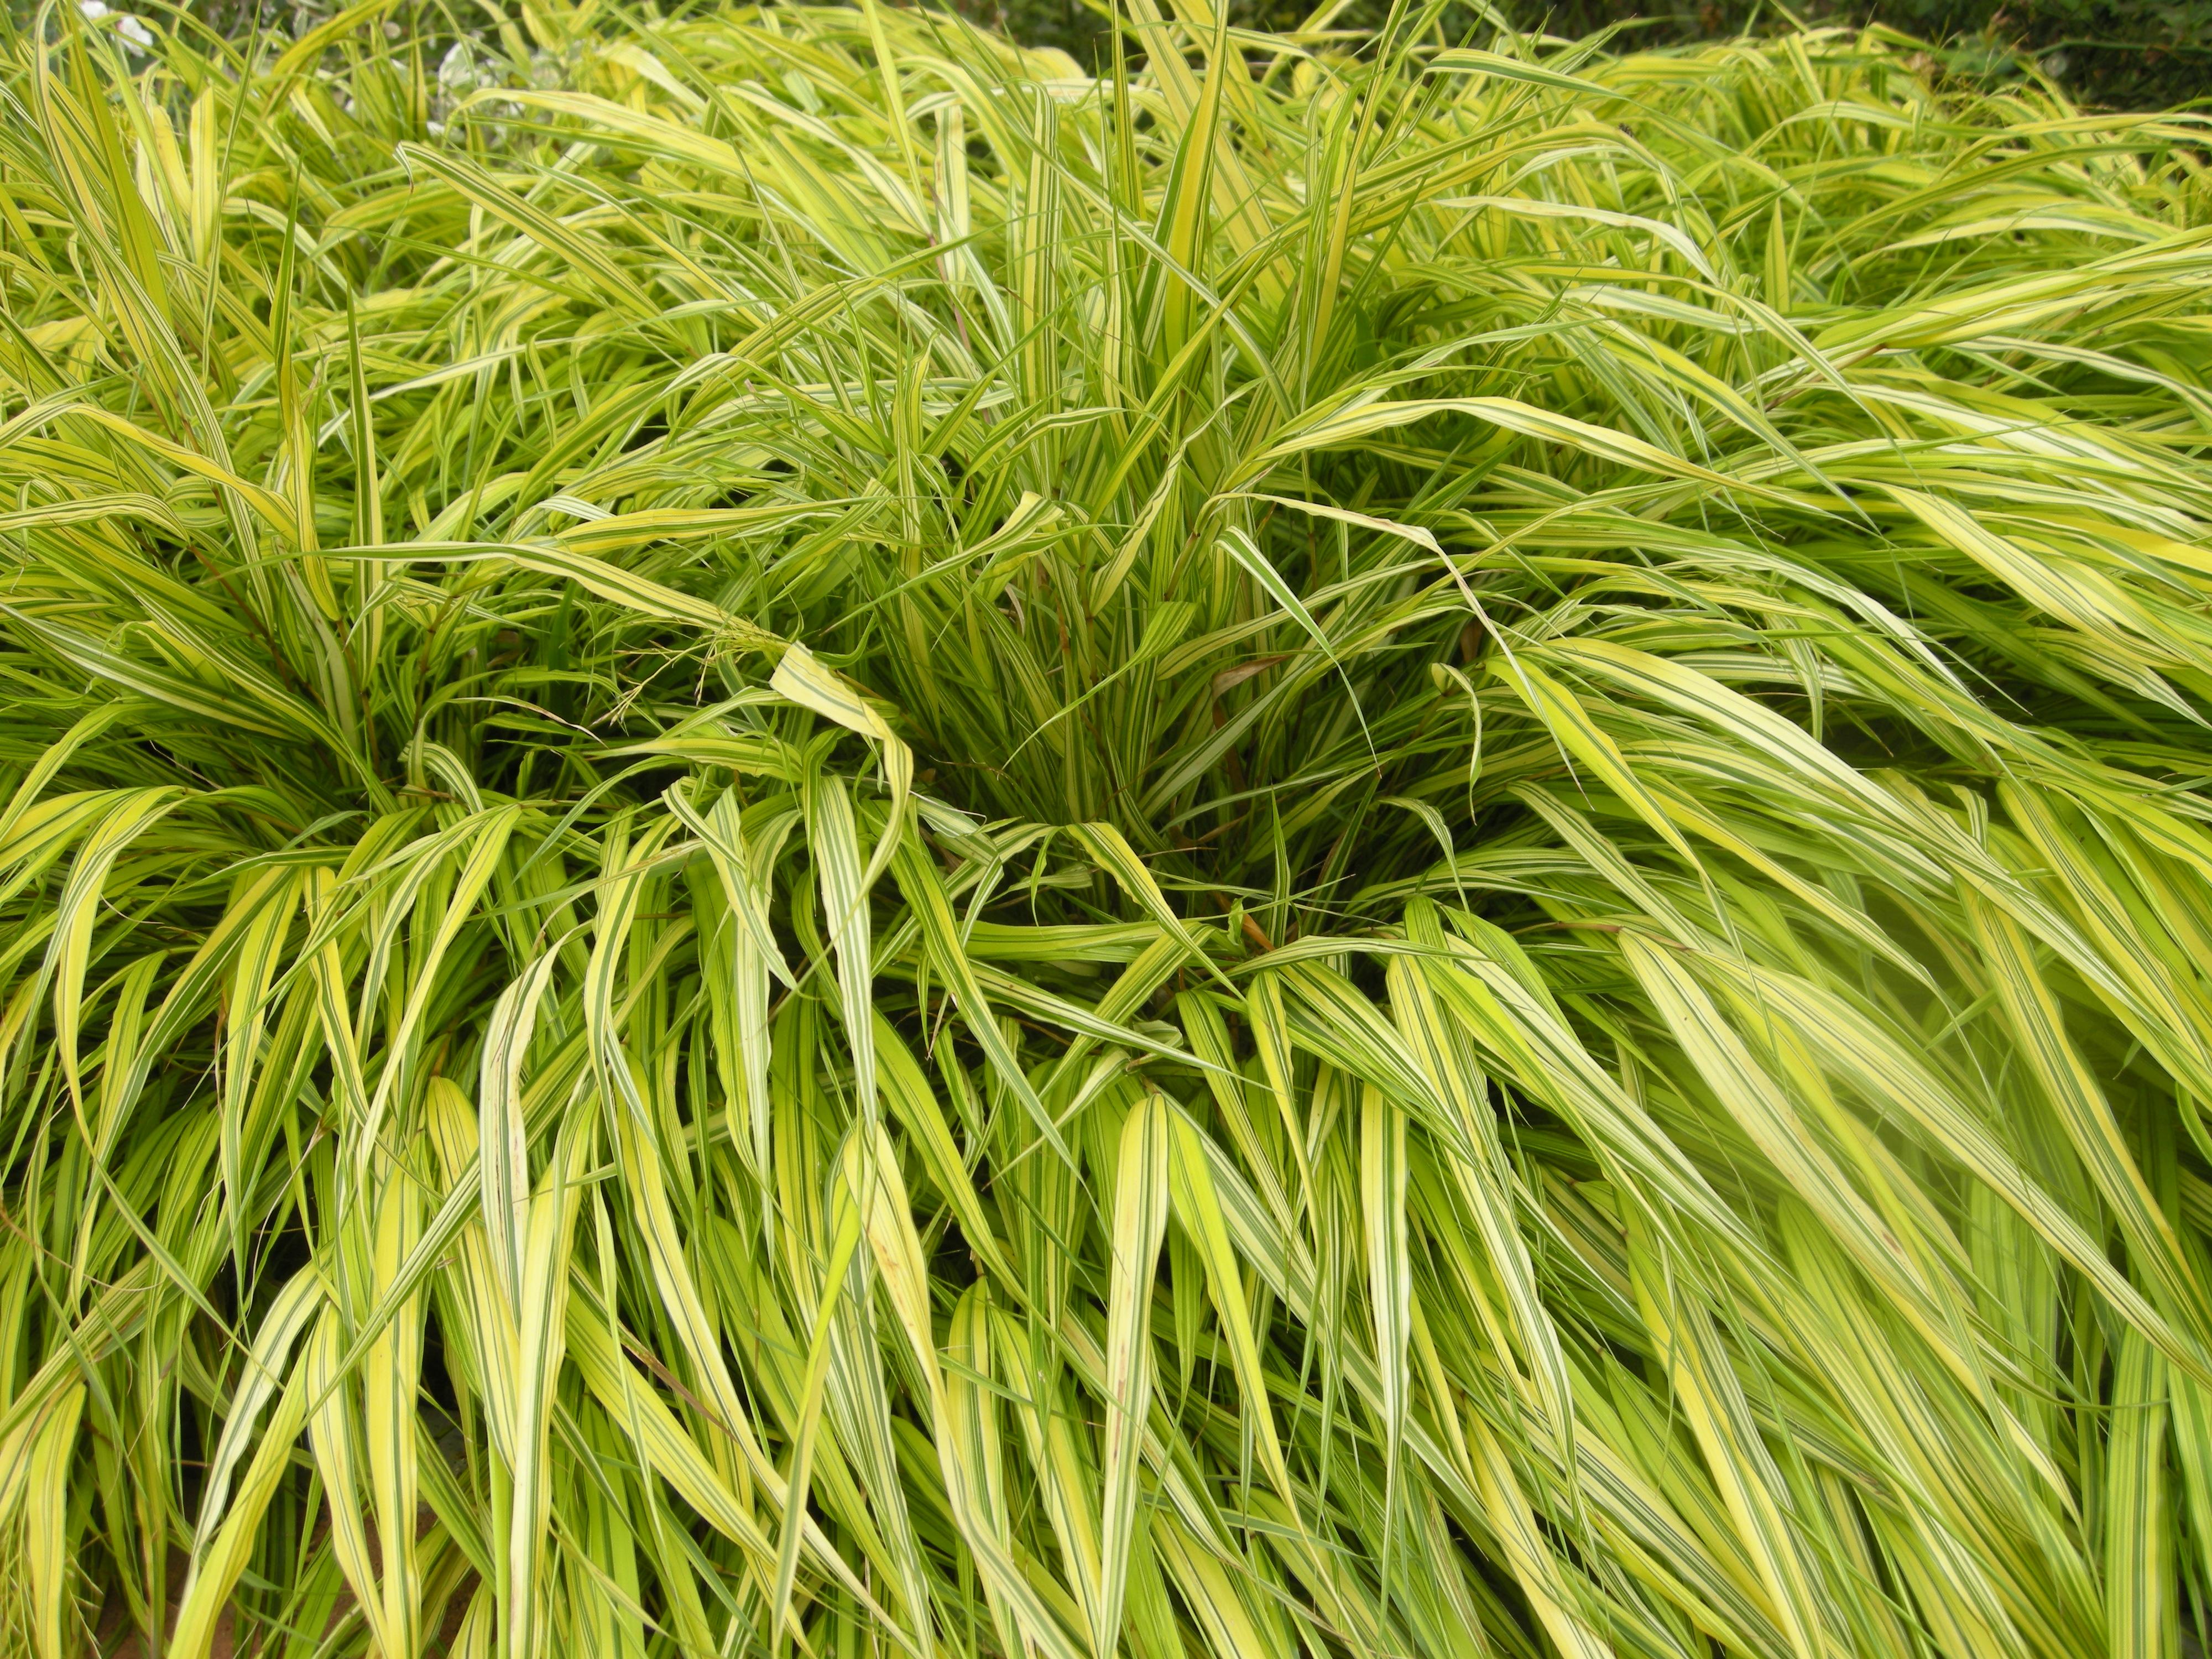 Hakonechloa macra 39 aureola 15 08 2011 london for Japanese ornamental grass